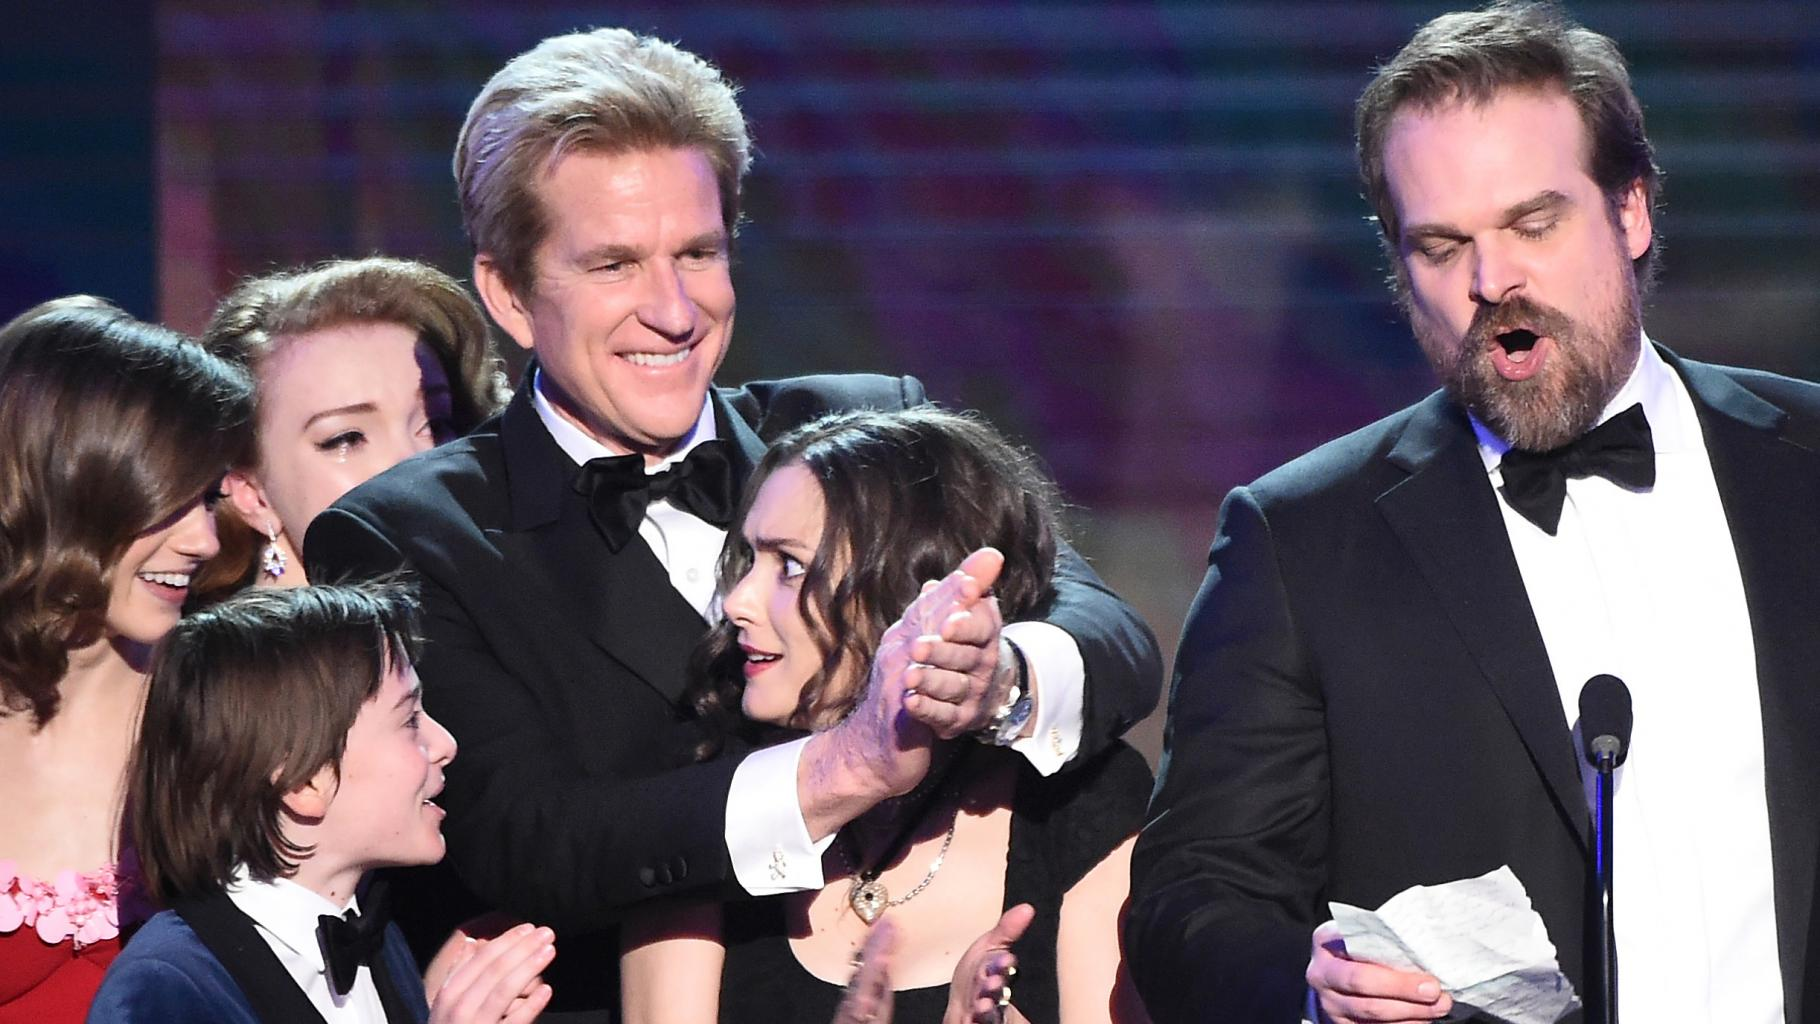 Winona Ryder's Facial Expressions Steal the Show at SAG Awards